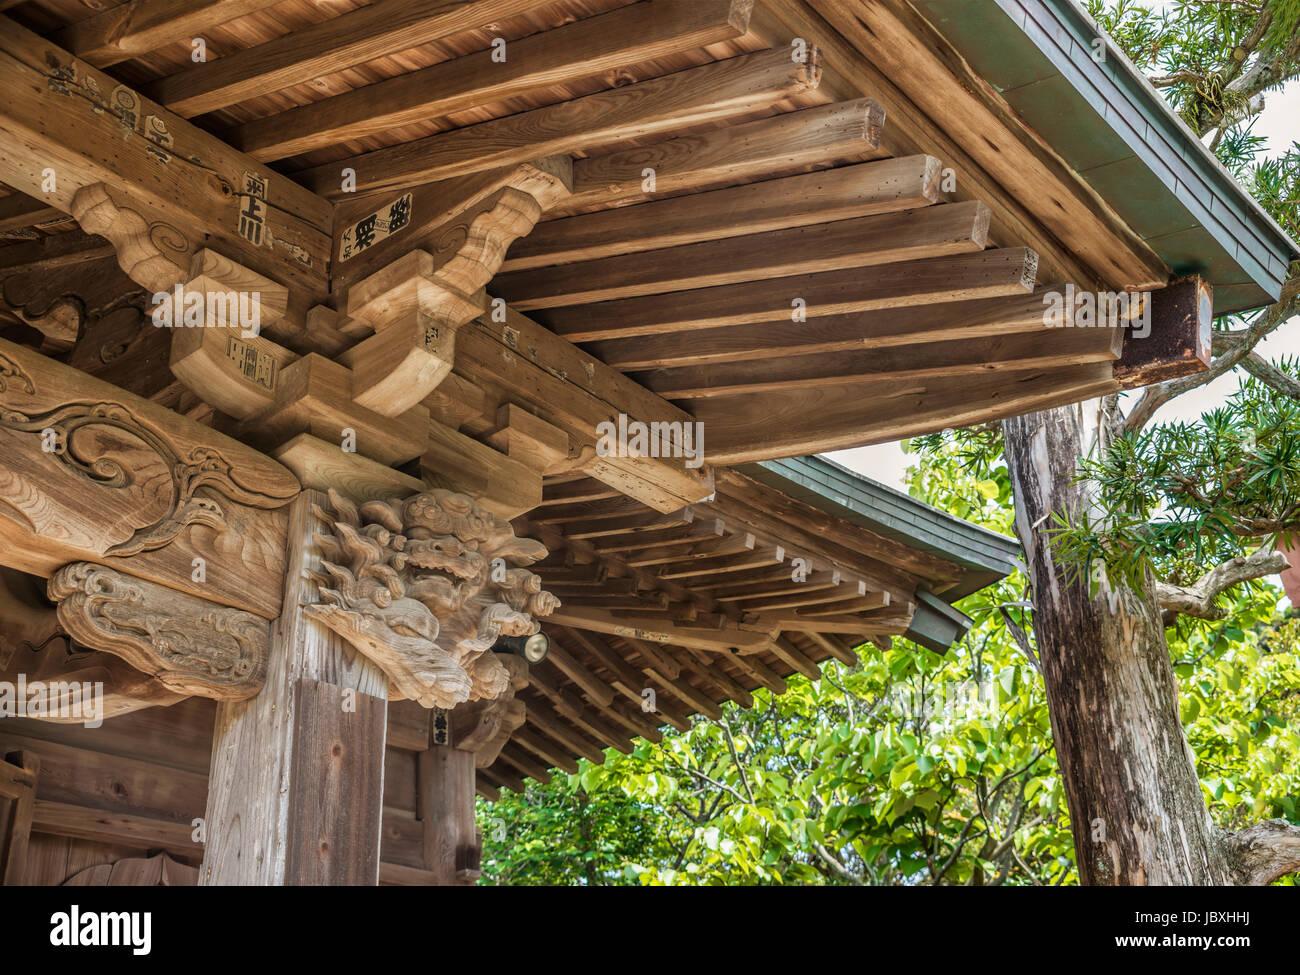 Detail at Gokuraku-ji temple, a Buddhist temple of the Shingon sect in Kamakura, Kanagawa Prefecture, Japan. It - Stock Image